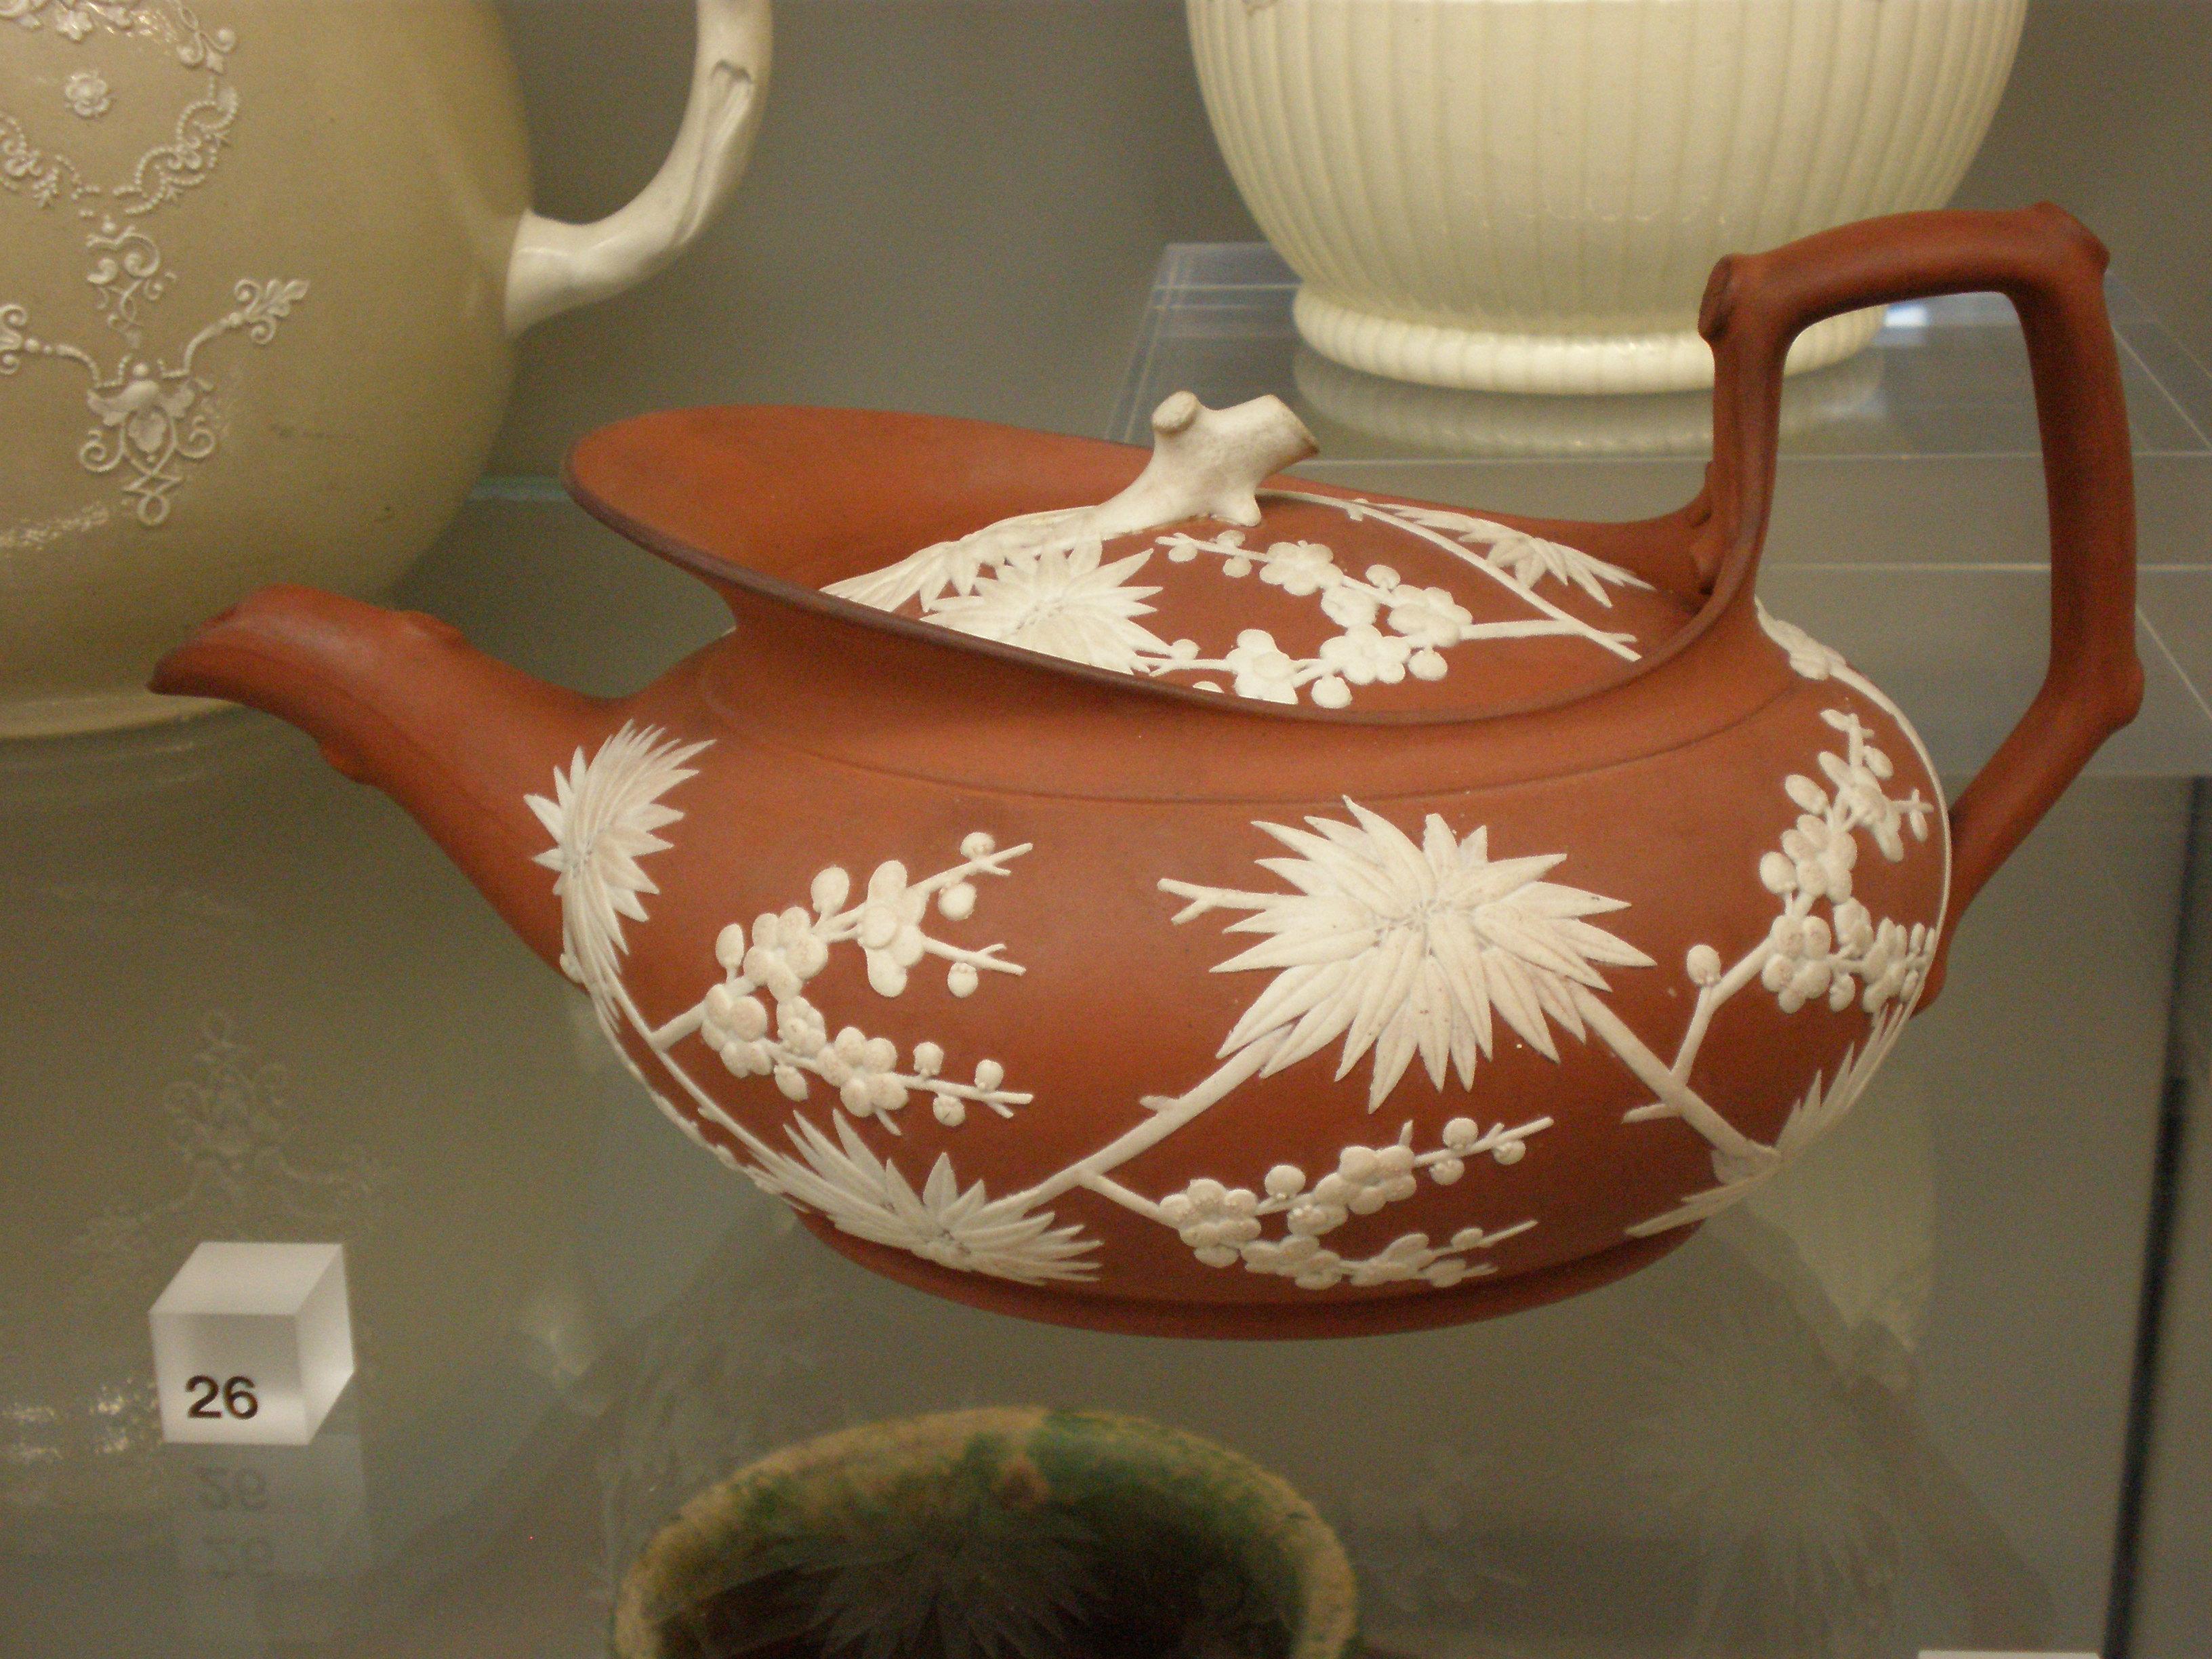 datant poterie faïence